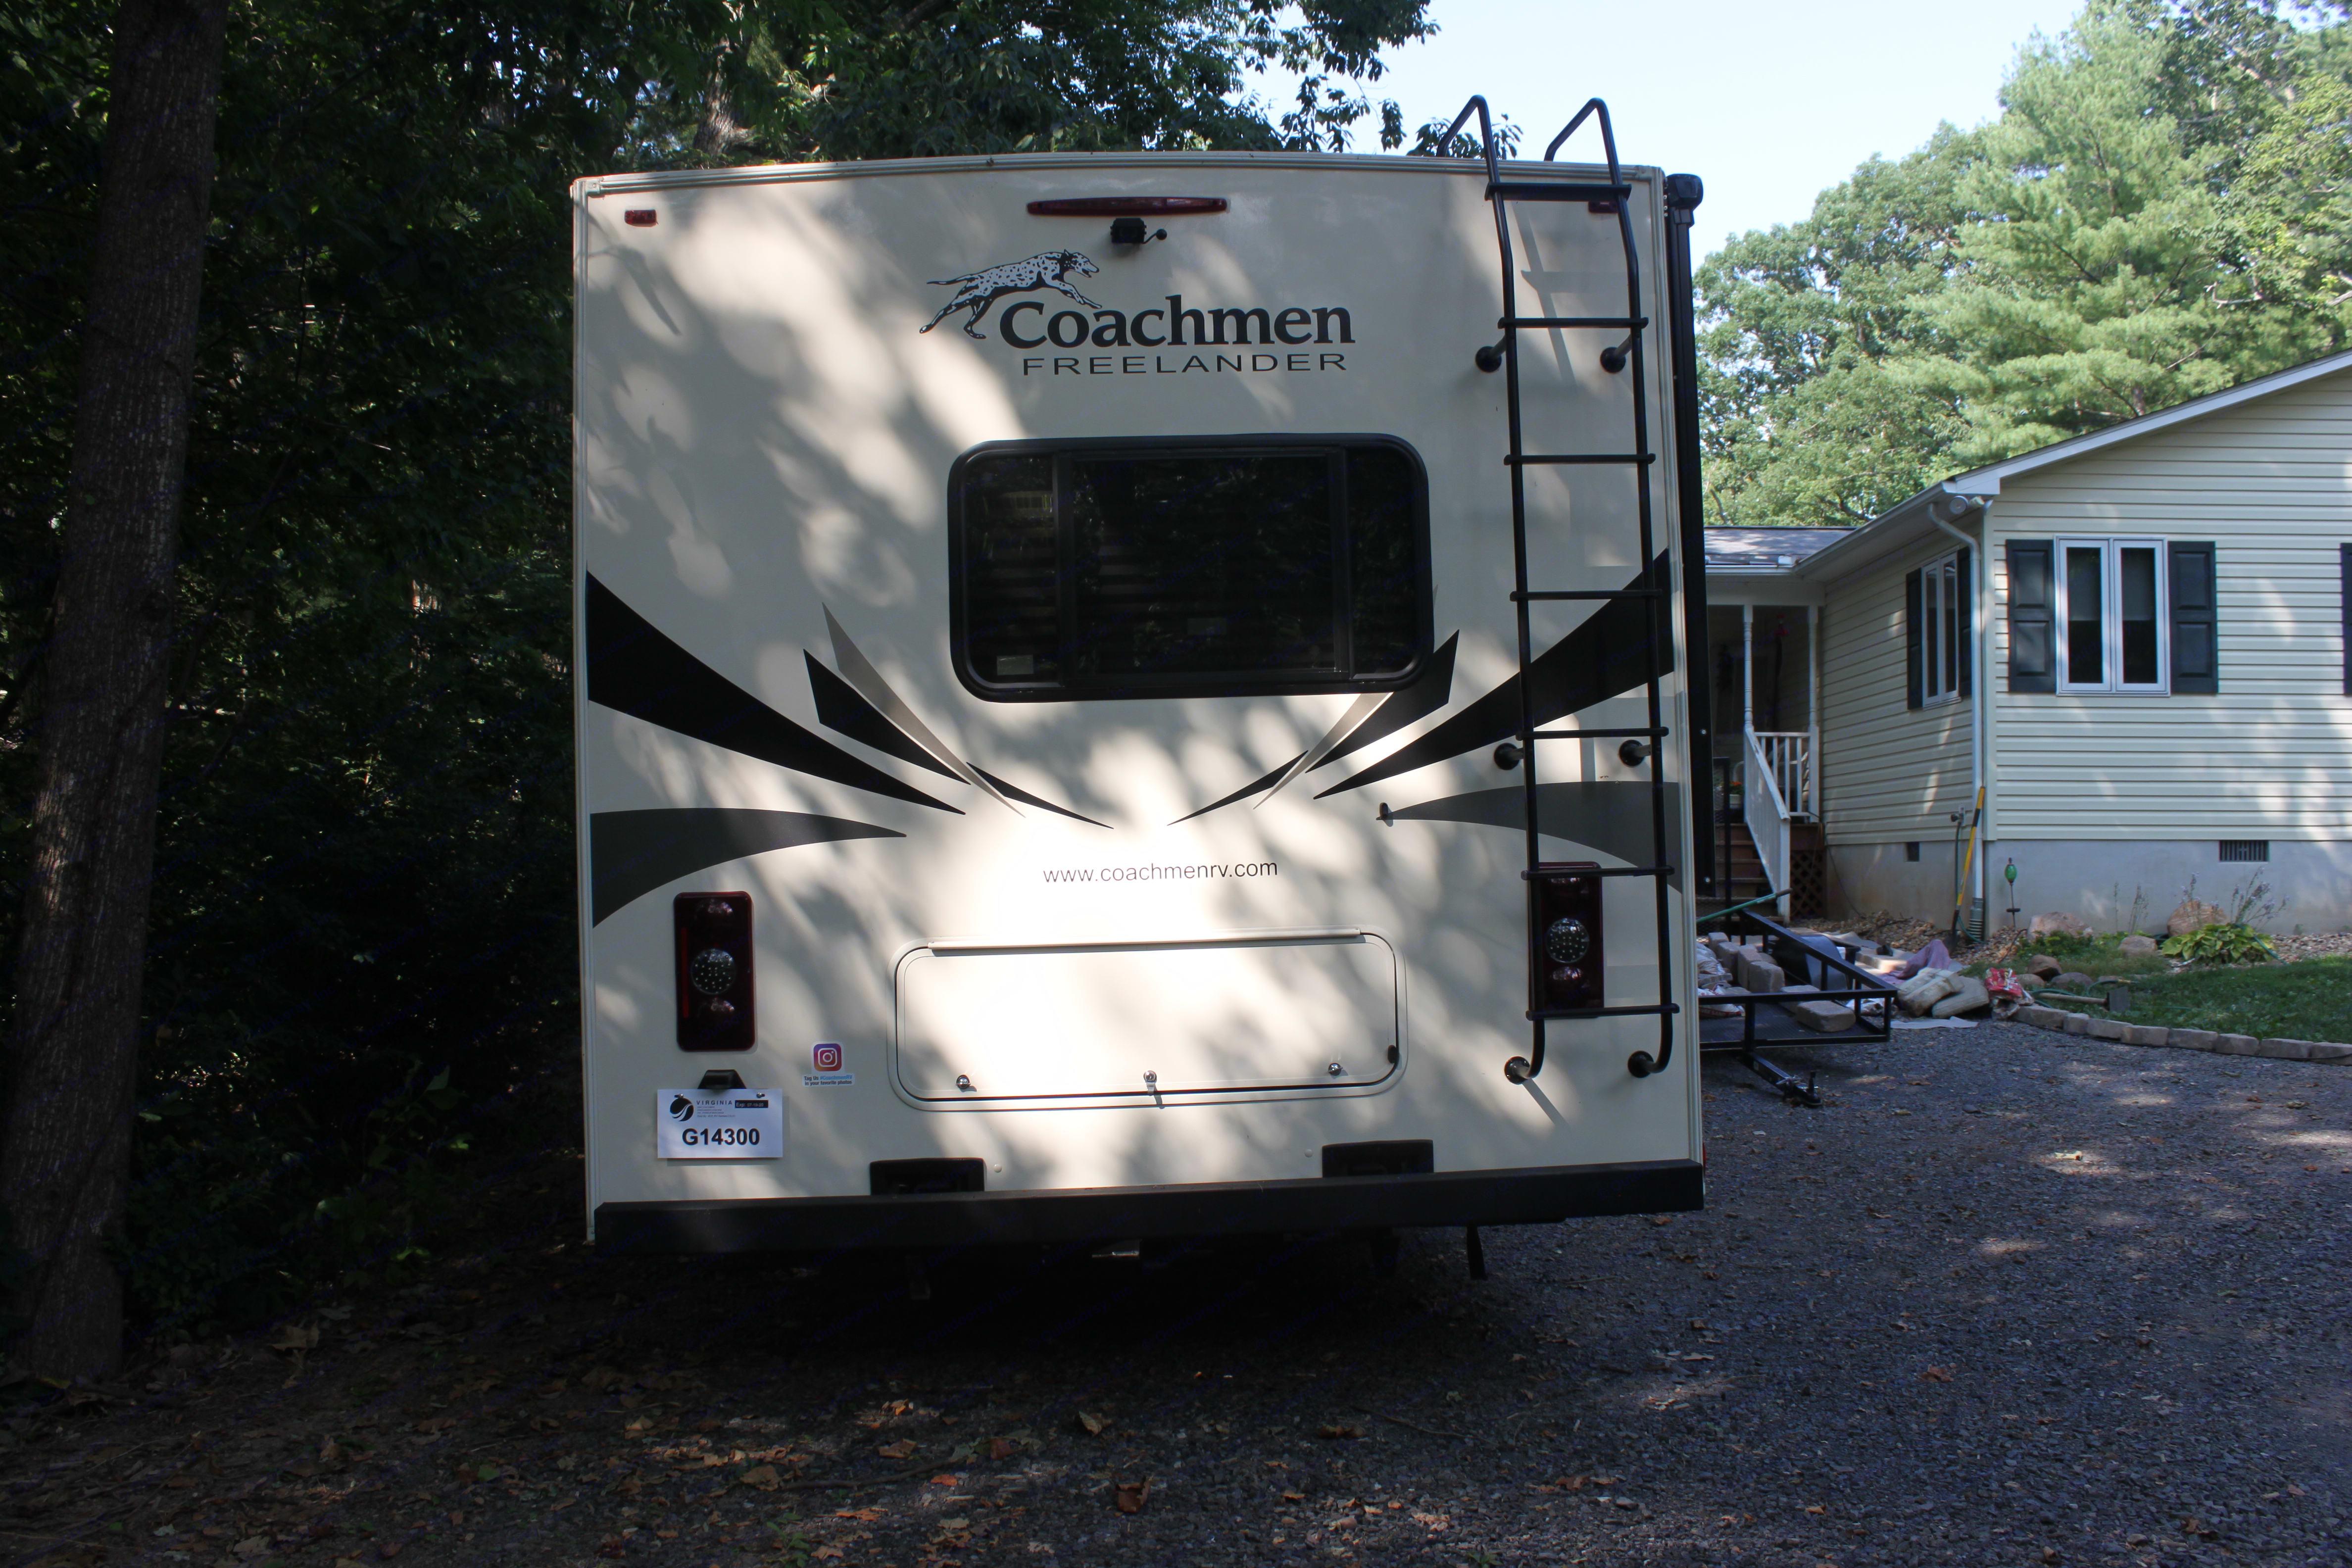 Backup camera. Coachmen Freelander 2020